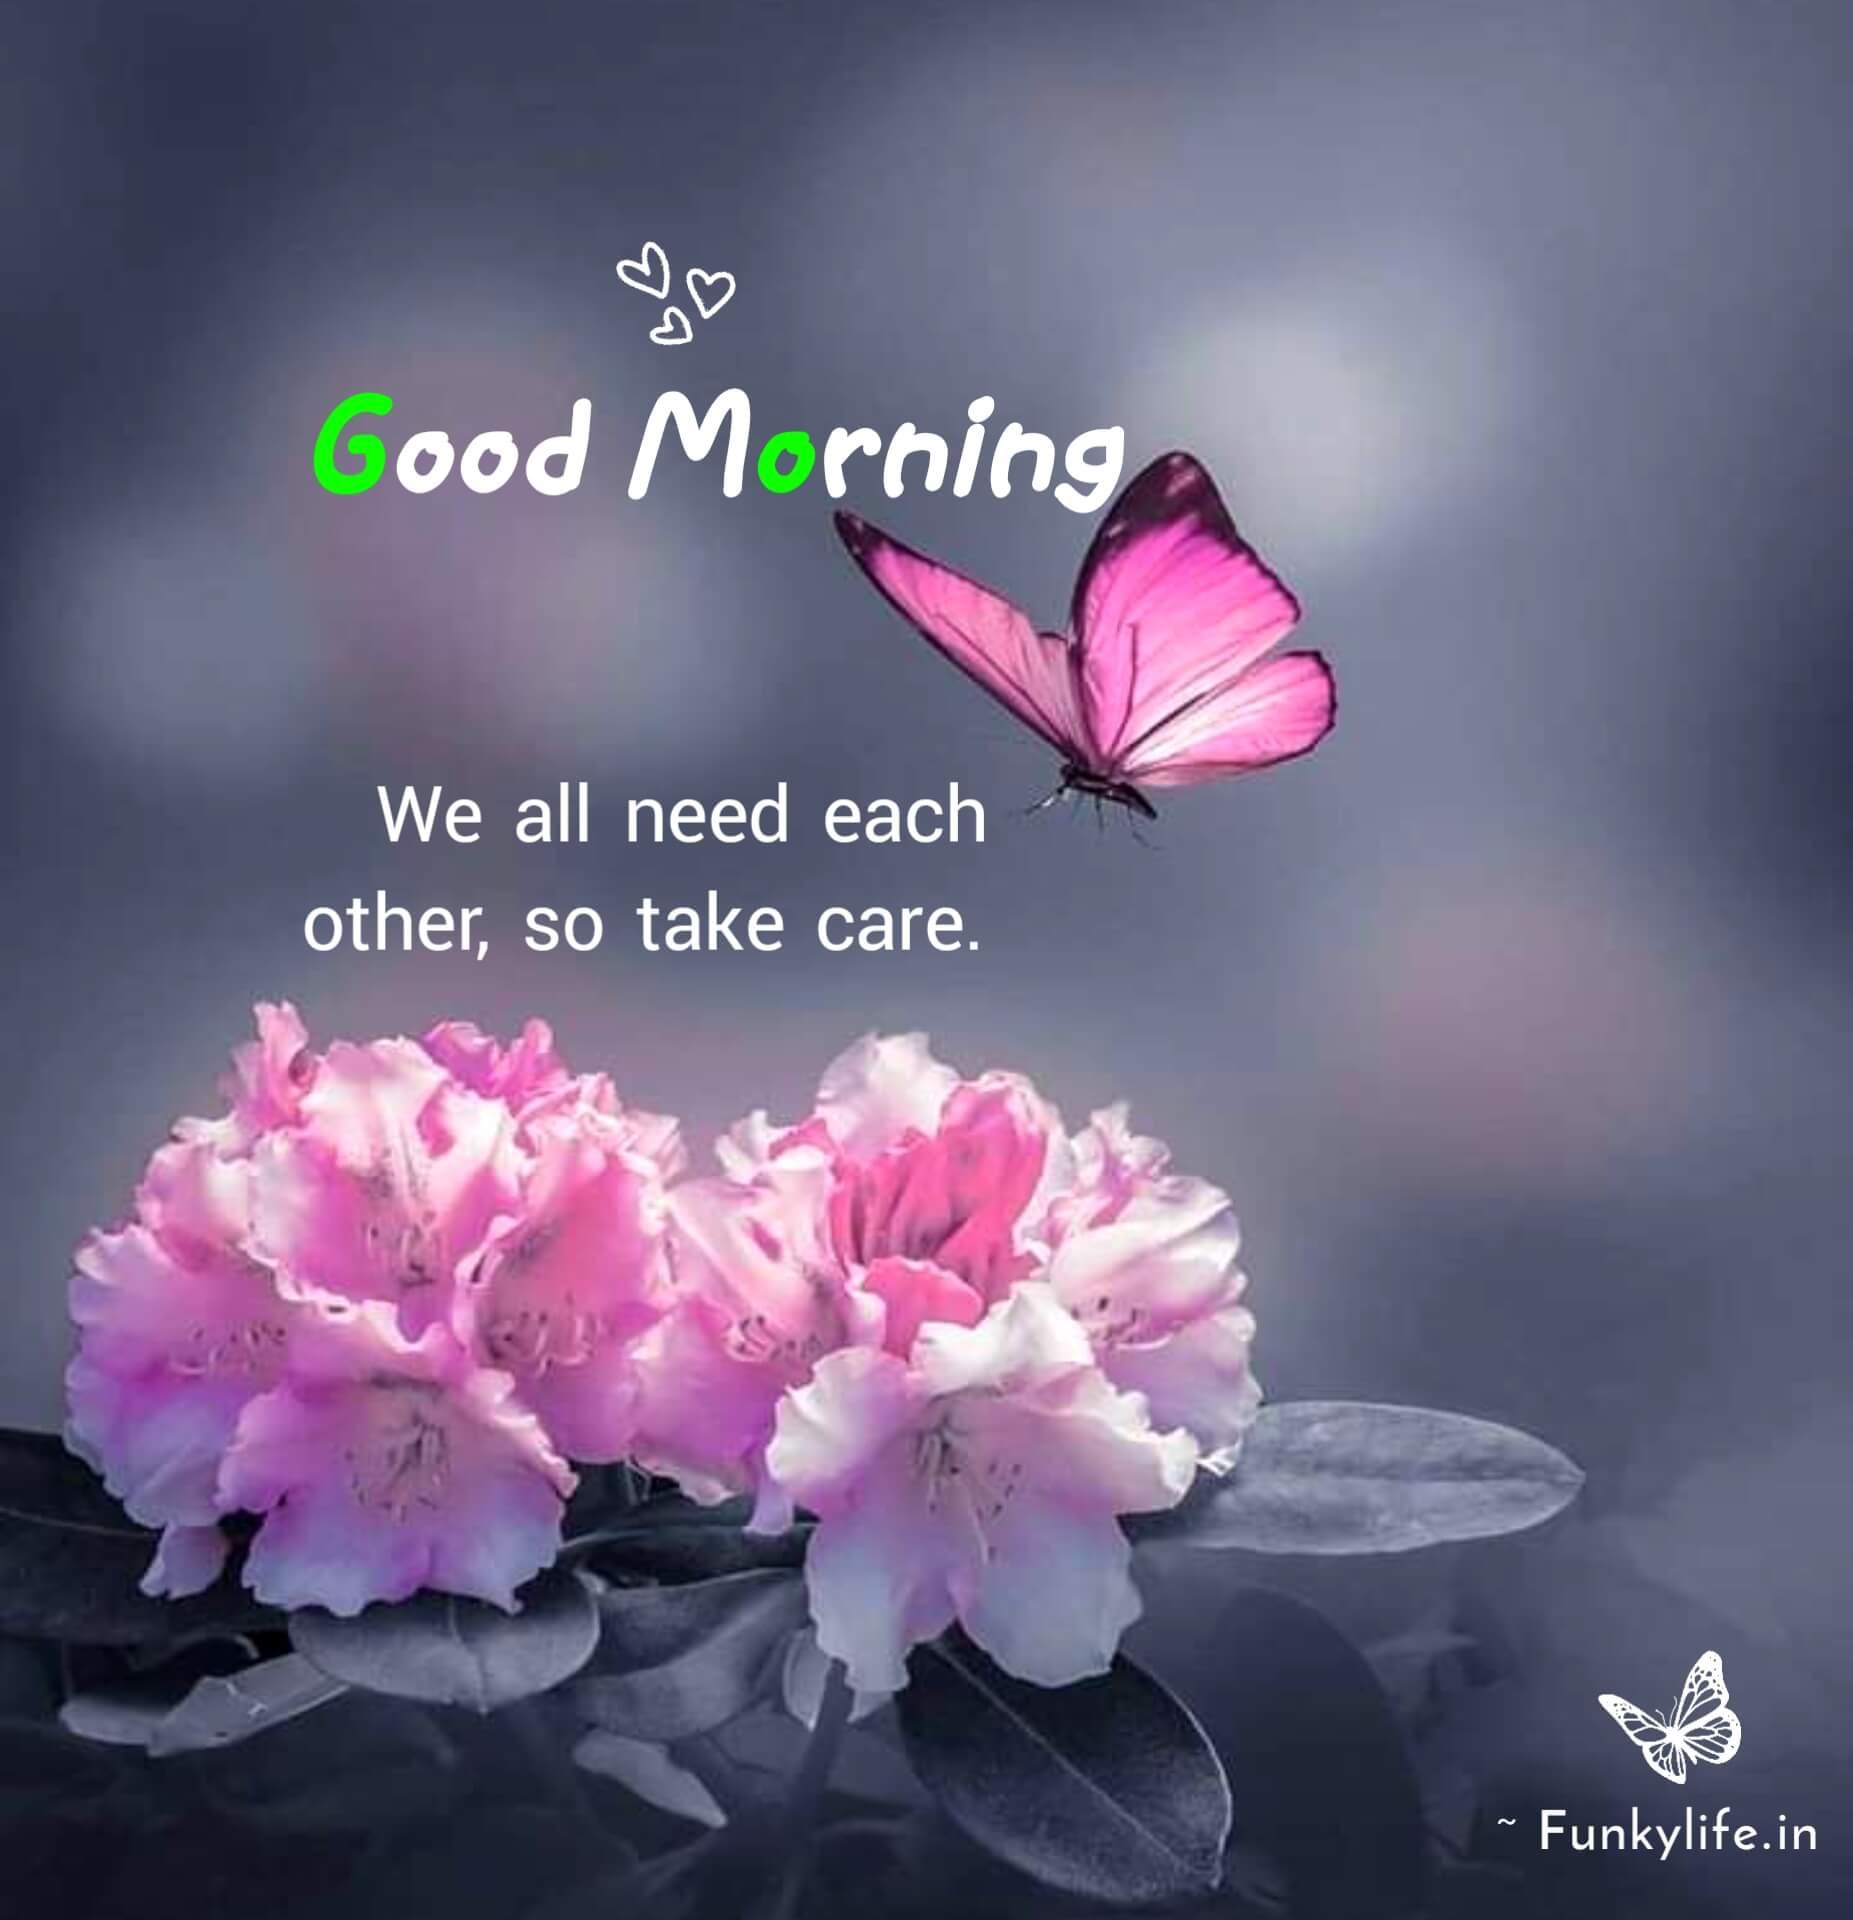 Good Morning Messages Photos